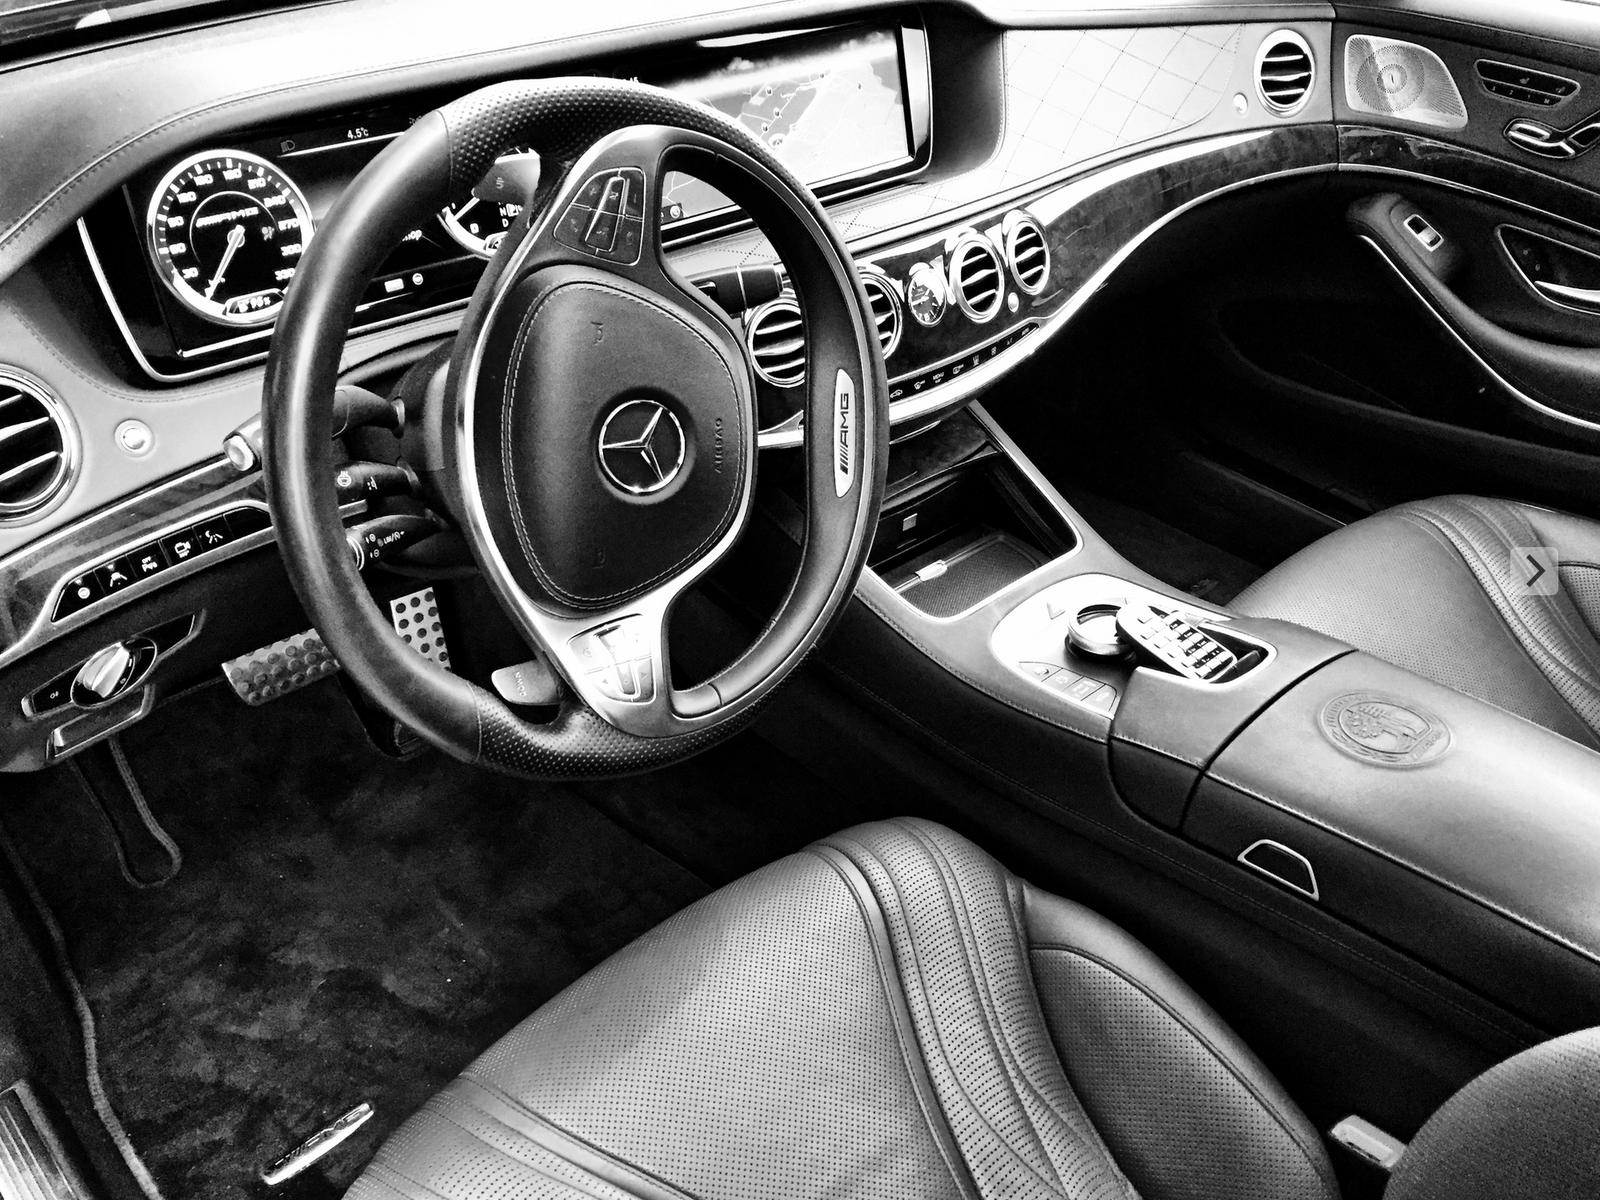 Mercedes Benz S 63 AMG 4Matic 2013